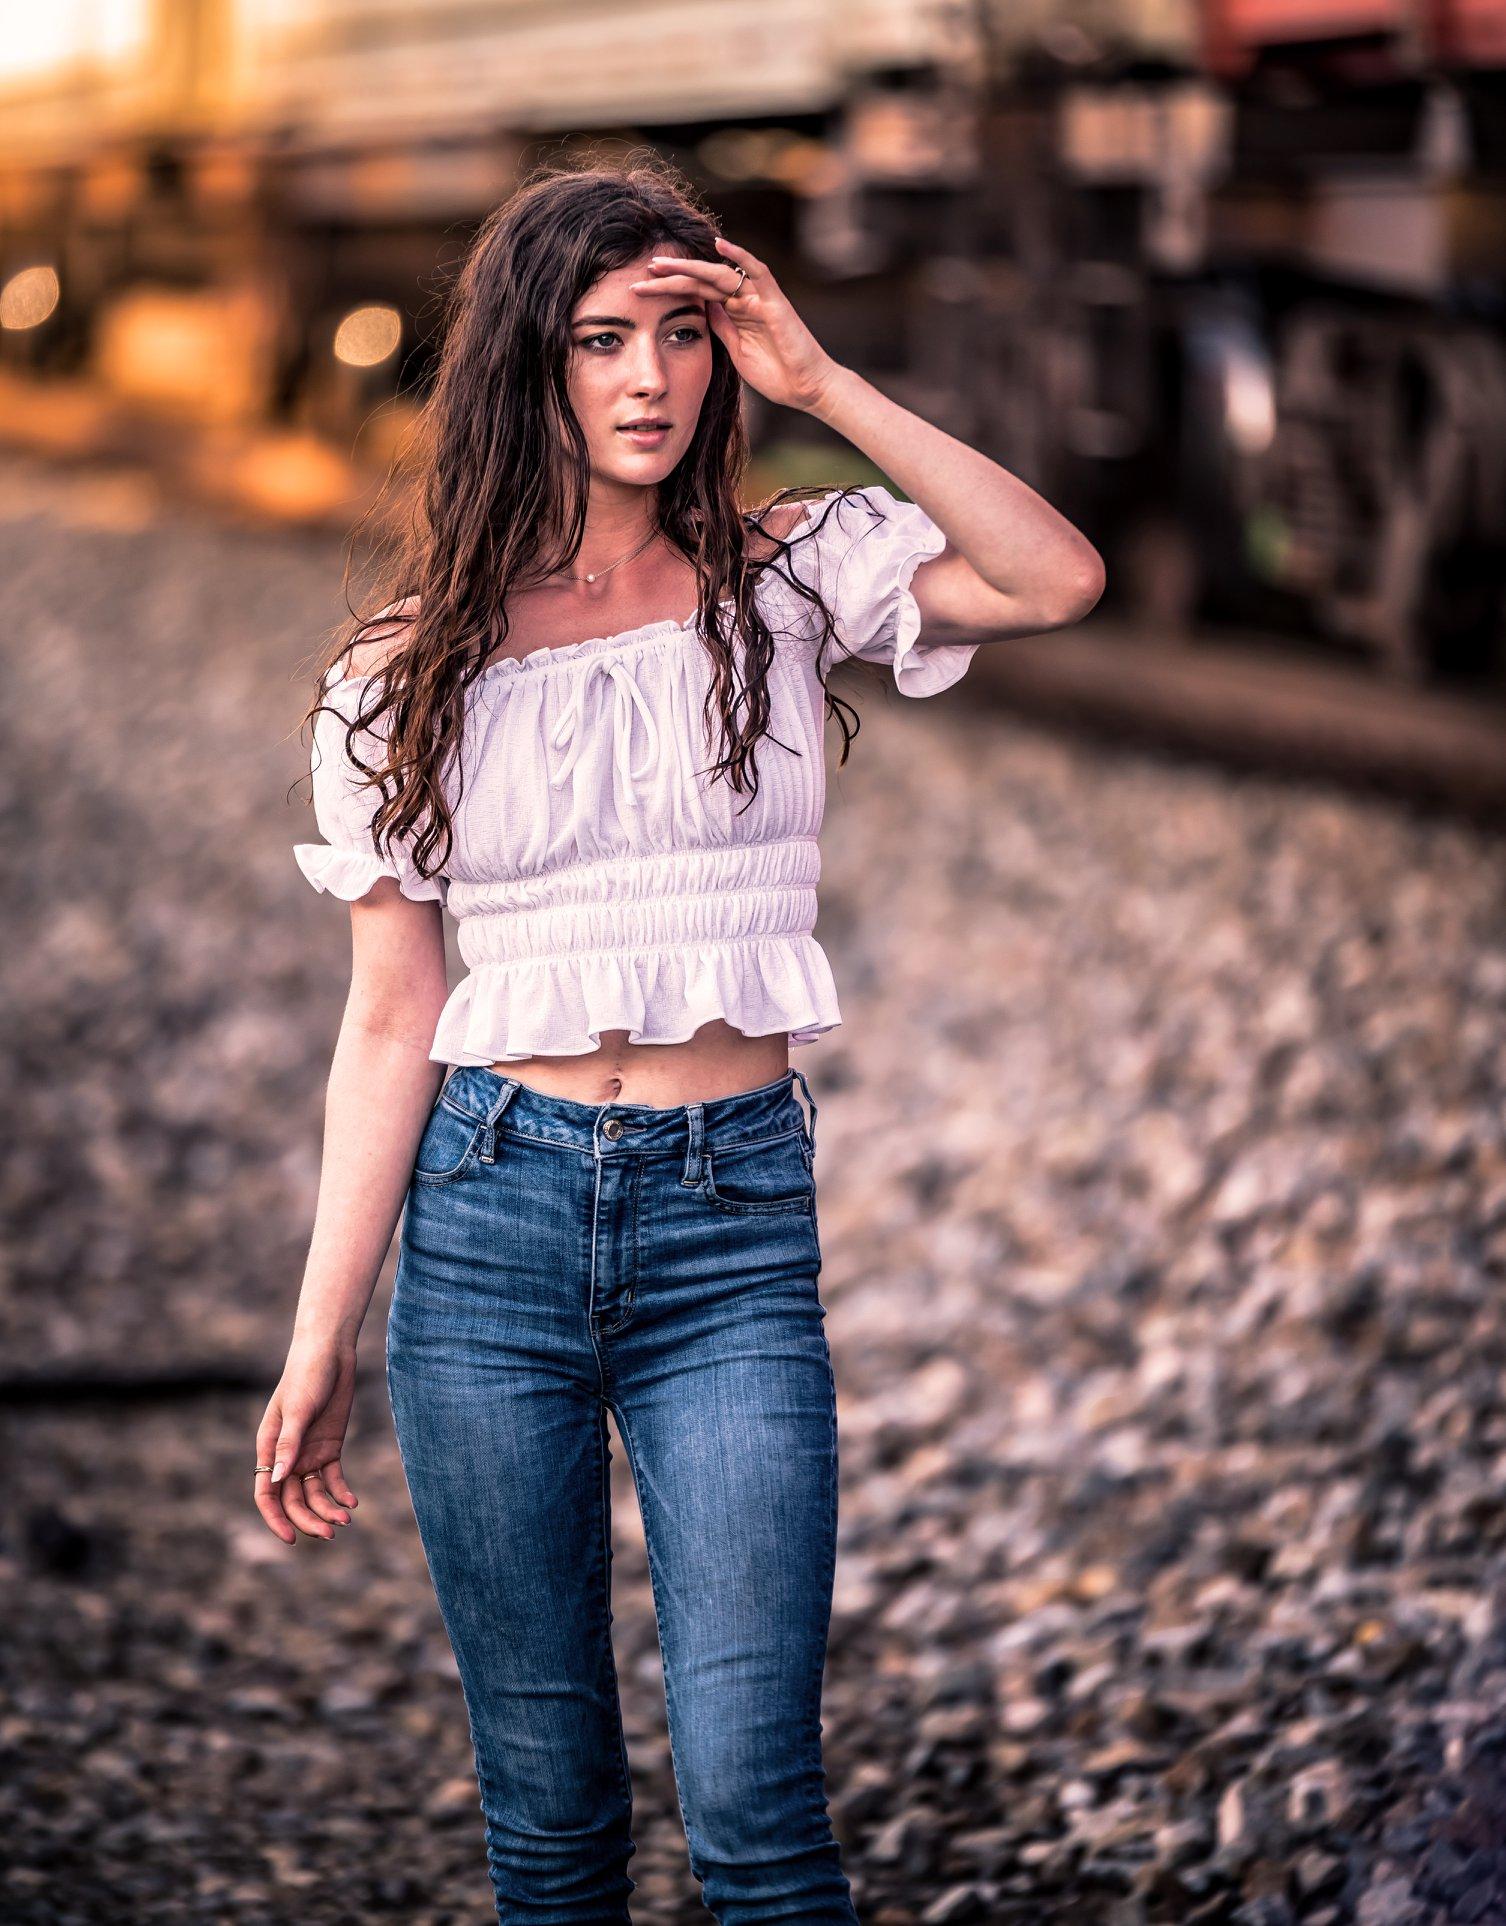 Portrait Photography Alpharetta